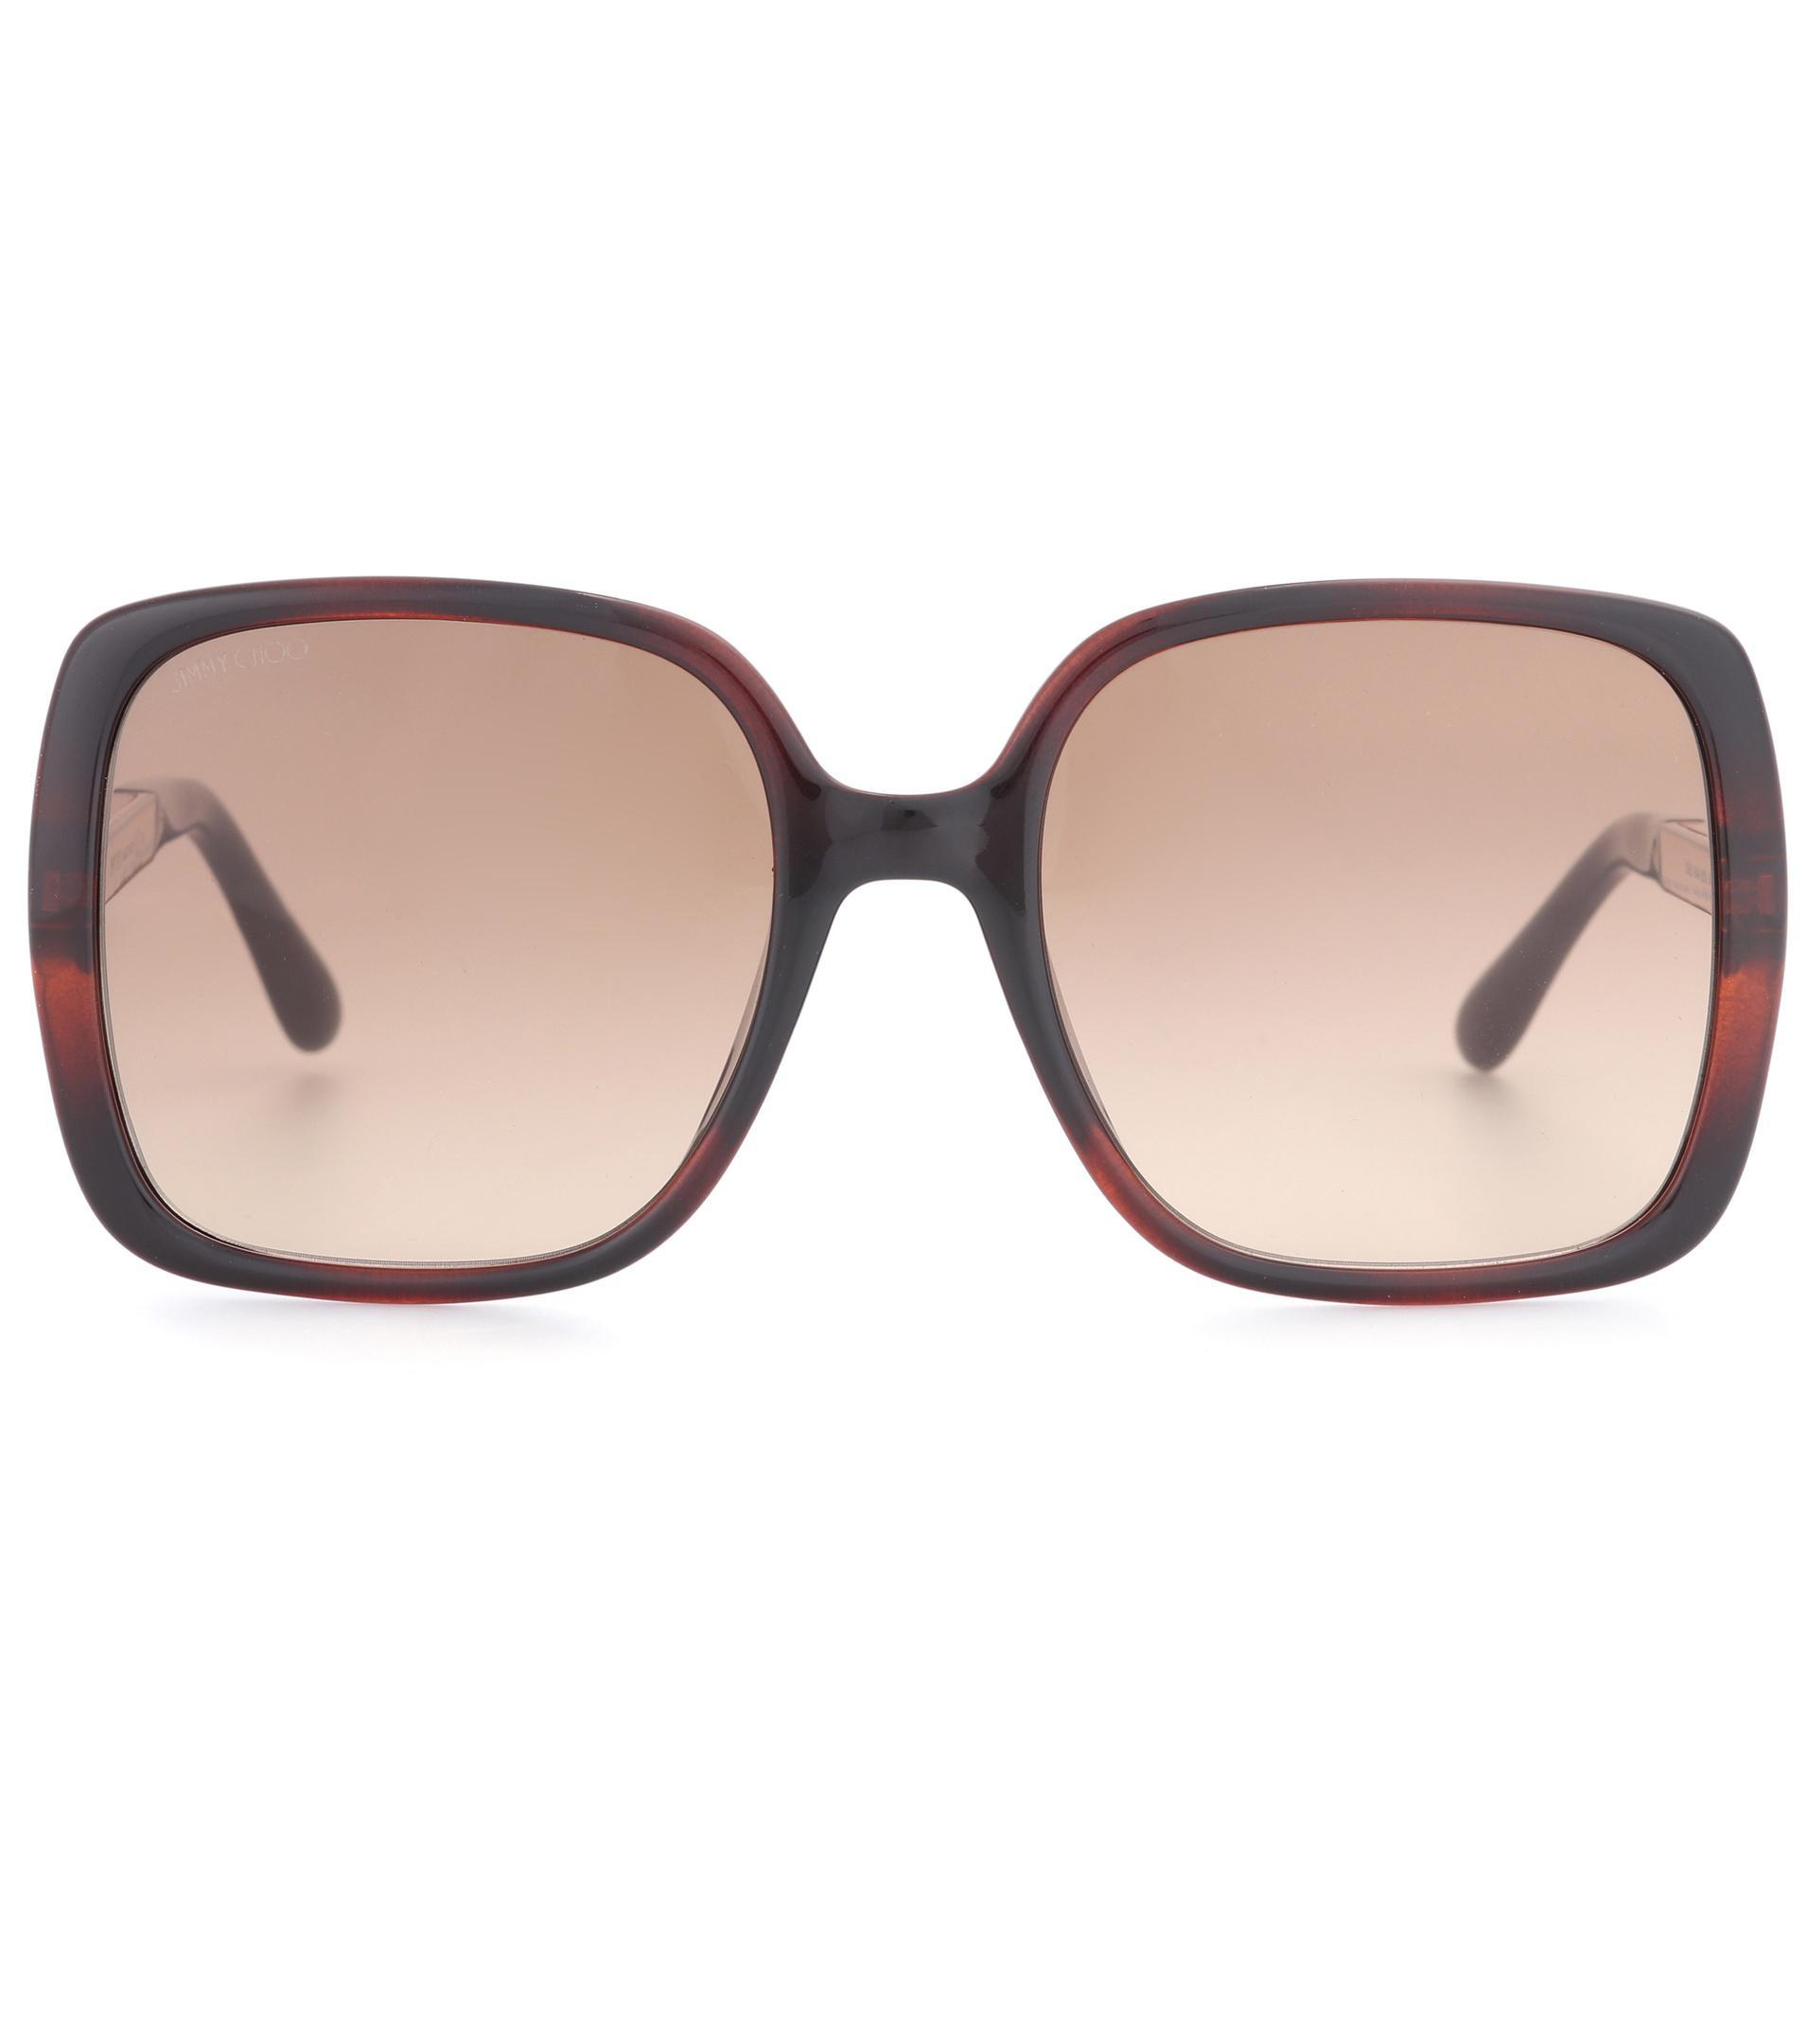 Jimmy choo Bobby tortoiseshell sunglasses Abzvnk